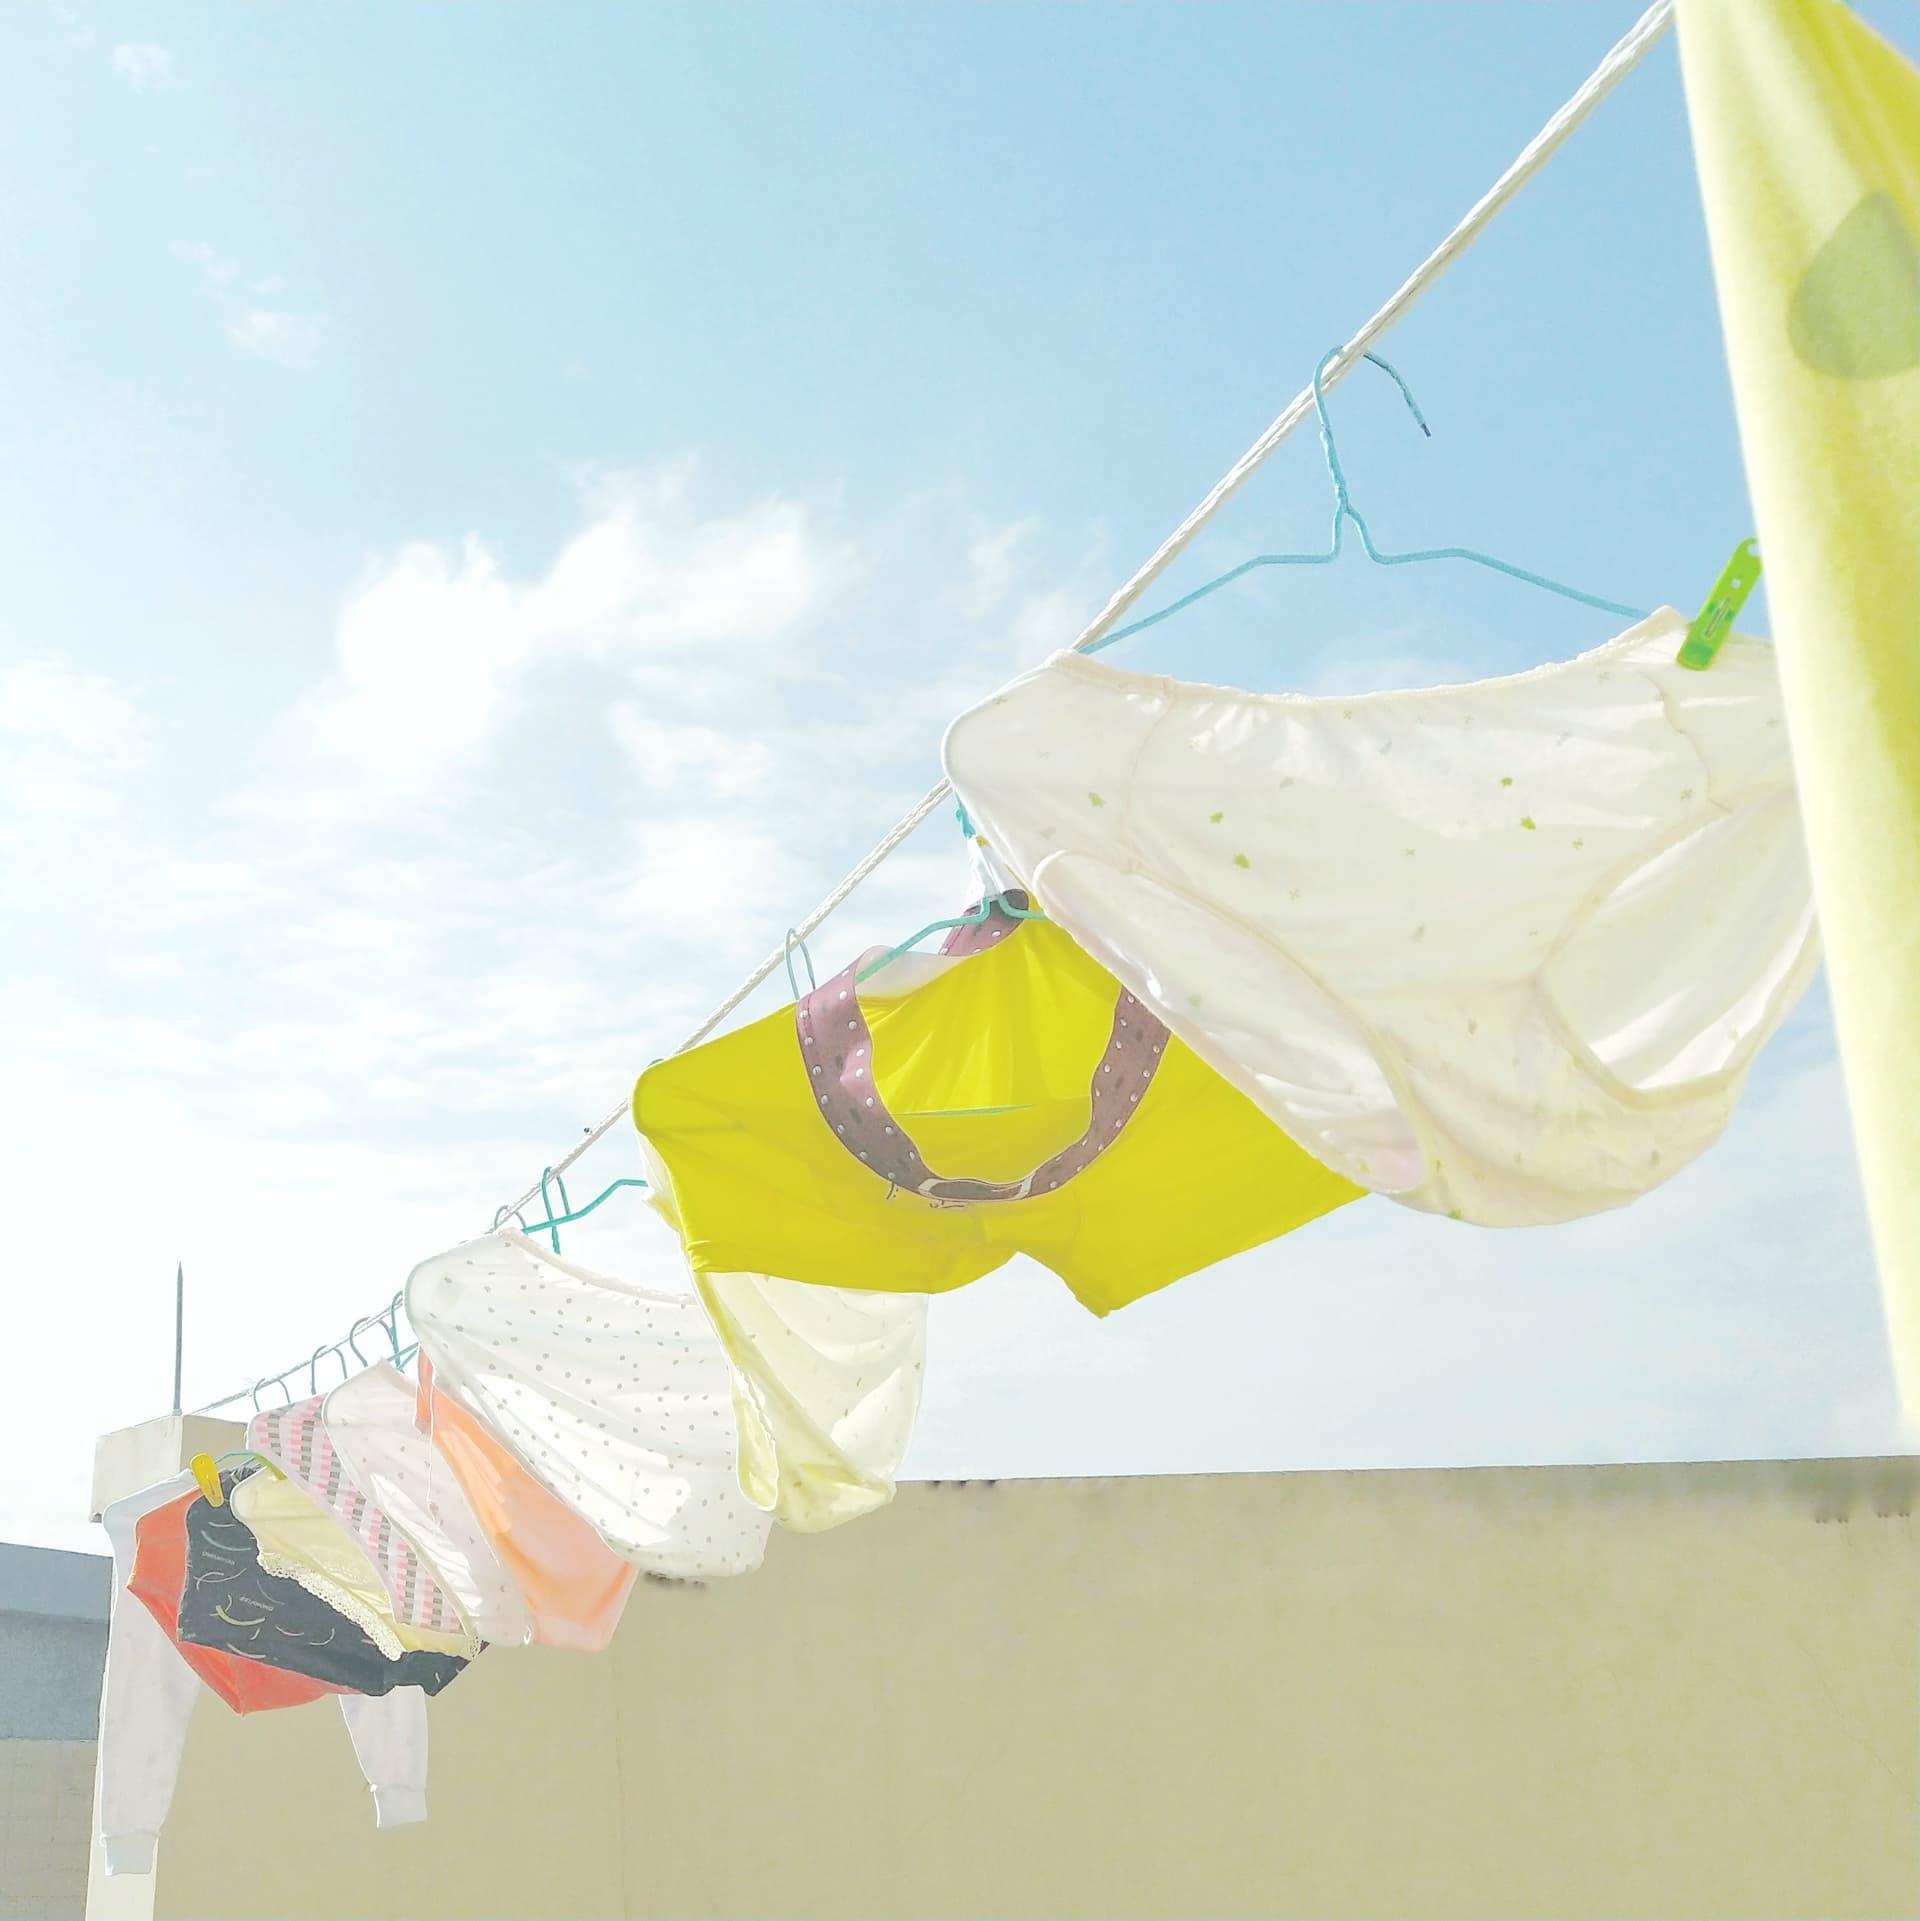 Underwear drying in sun